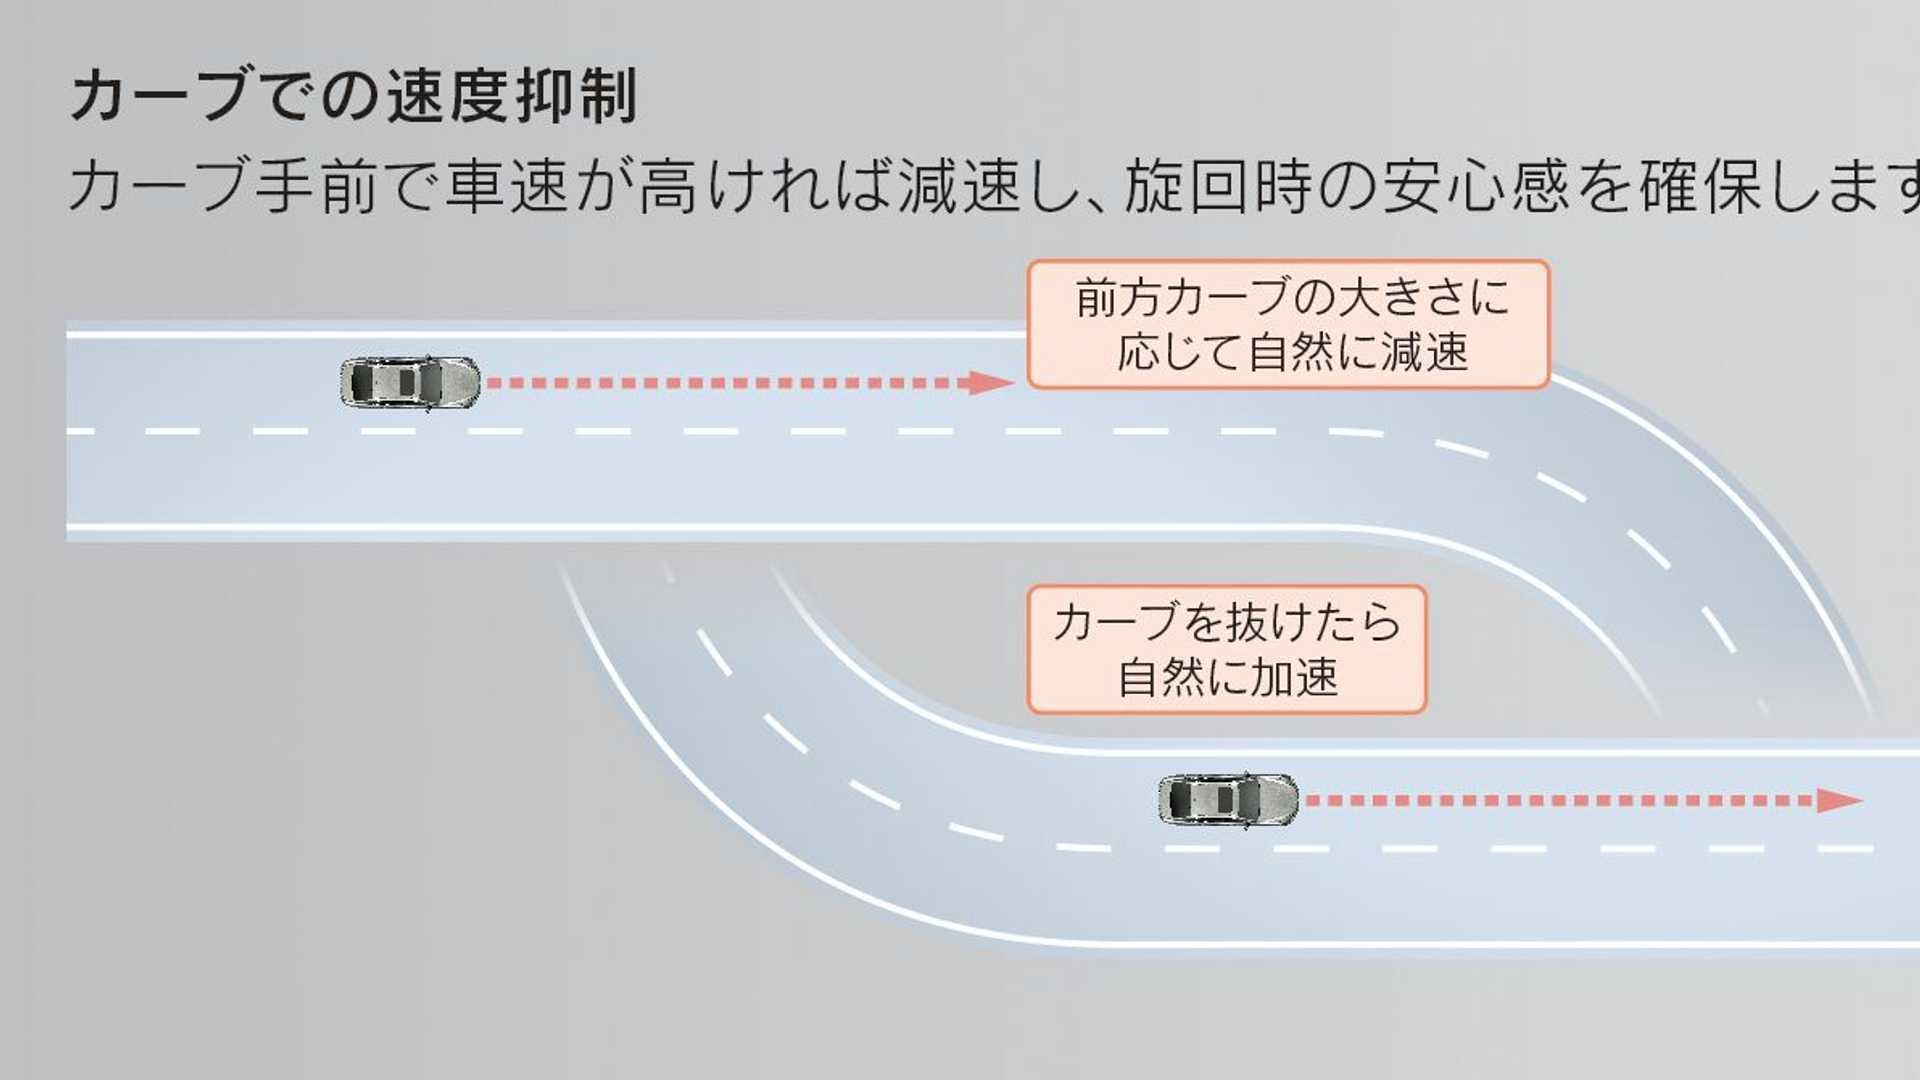 Lexus-LS-And-Toyota-Mirai-Advanced-Drive-32